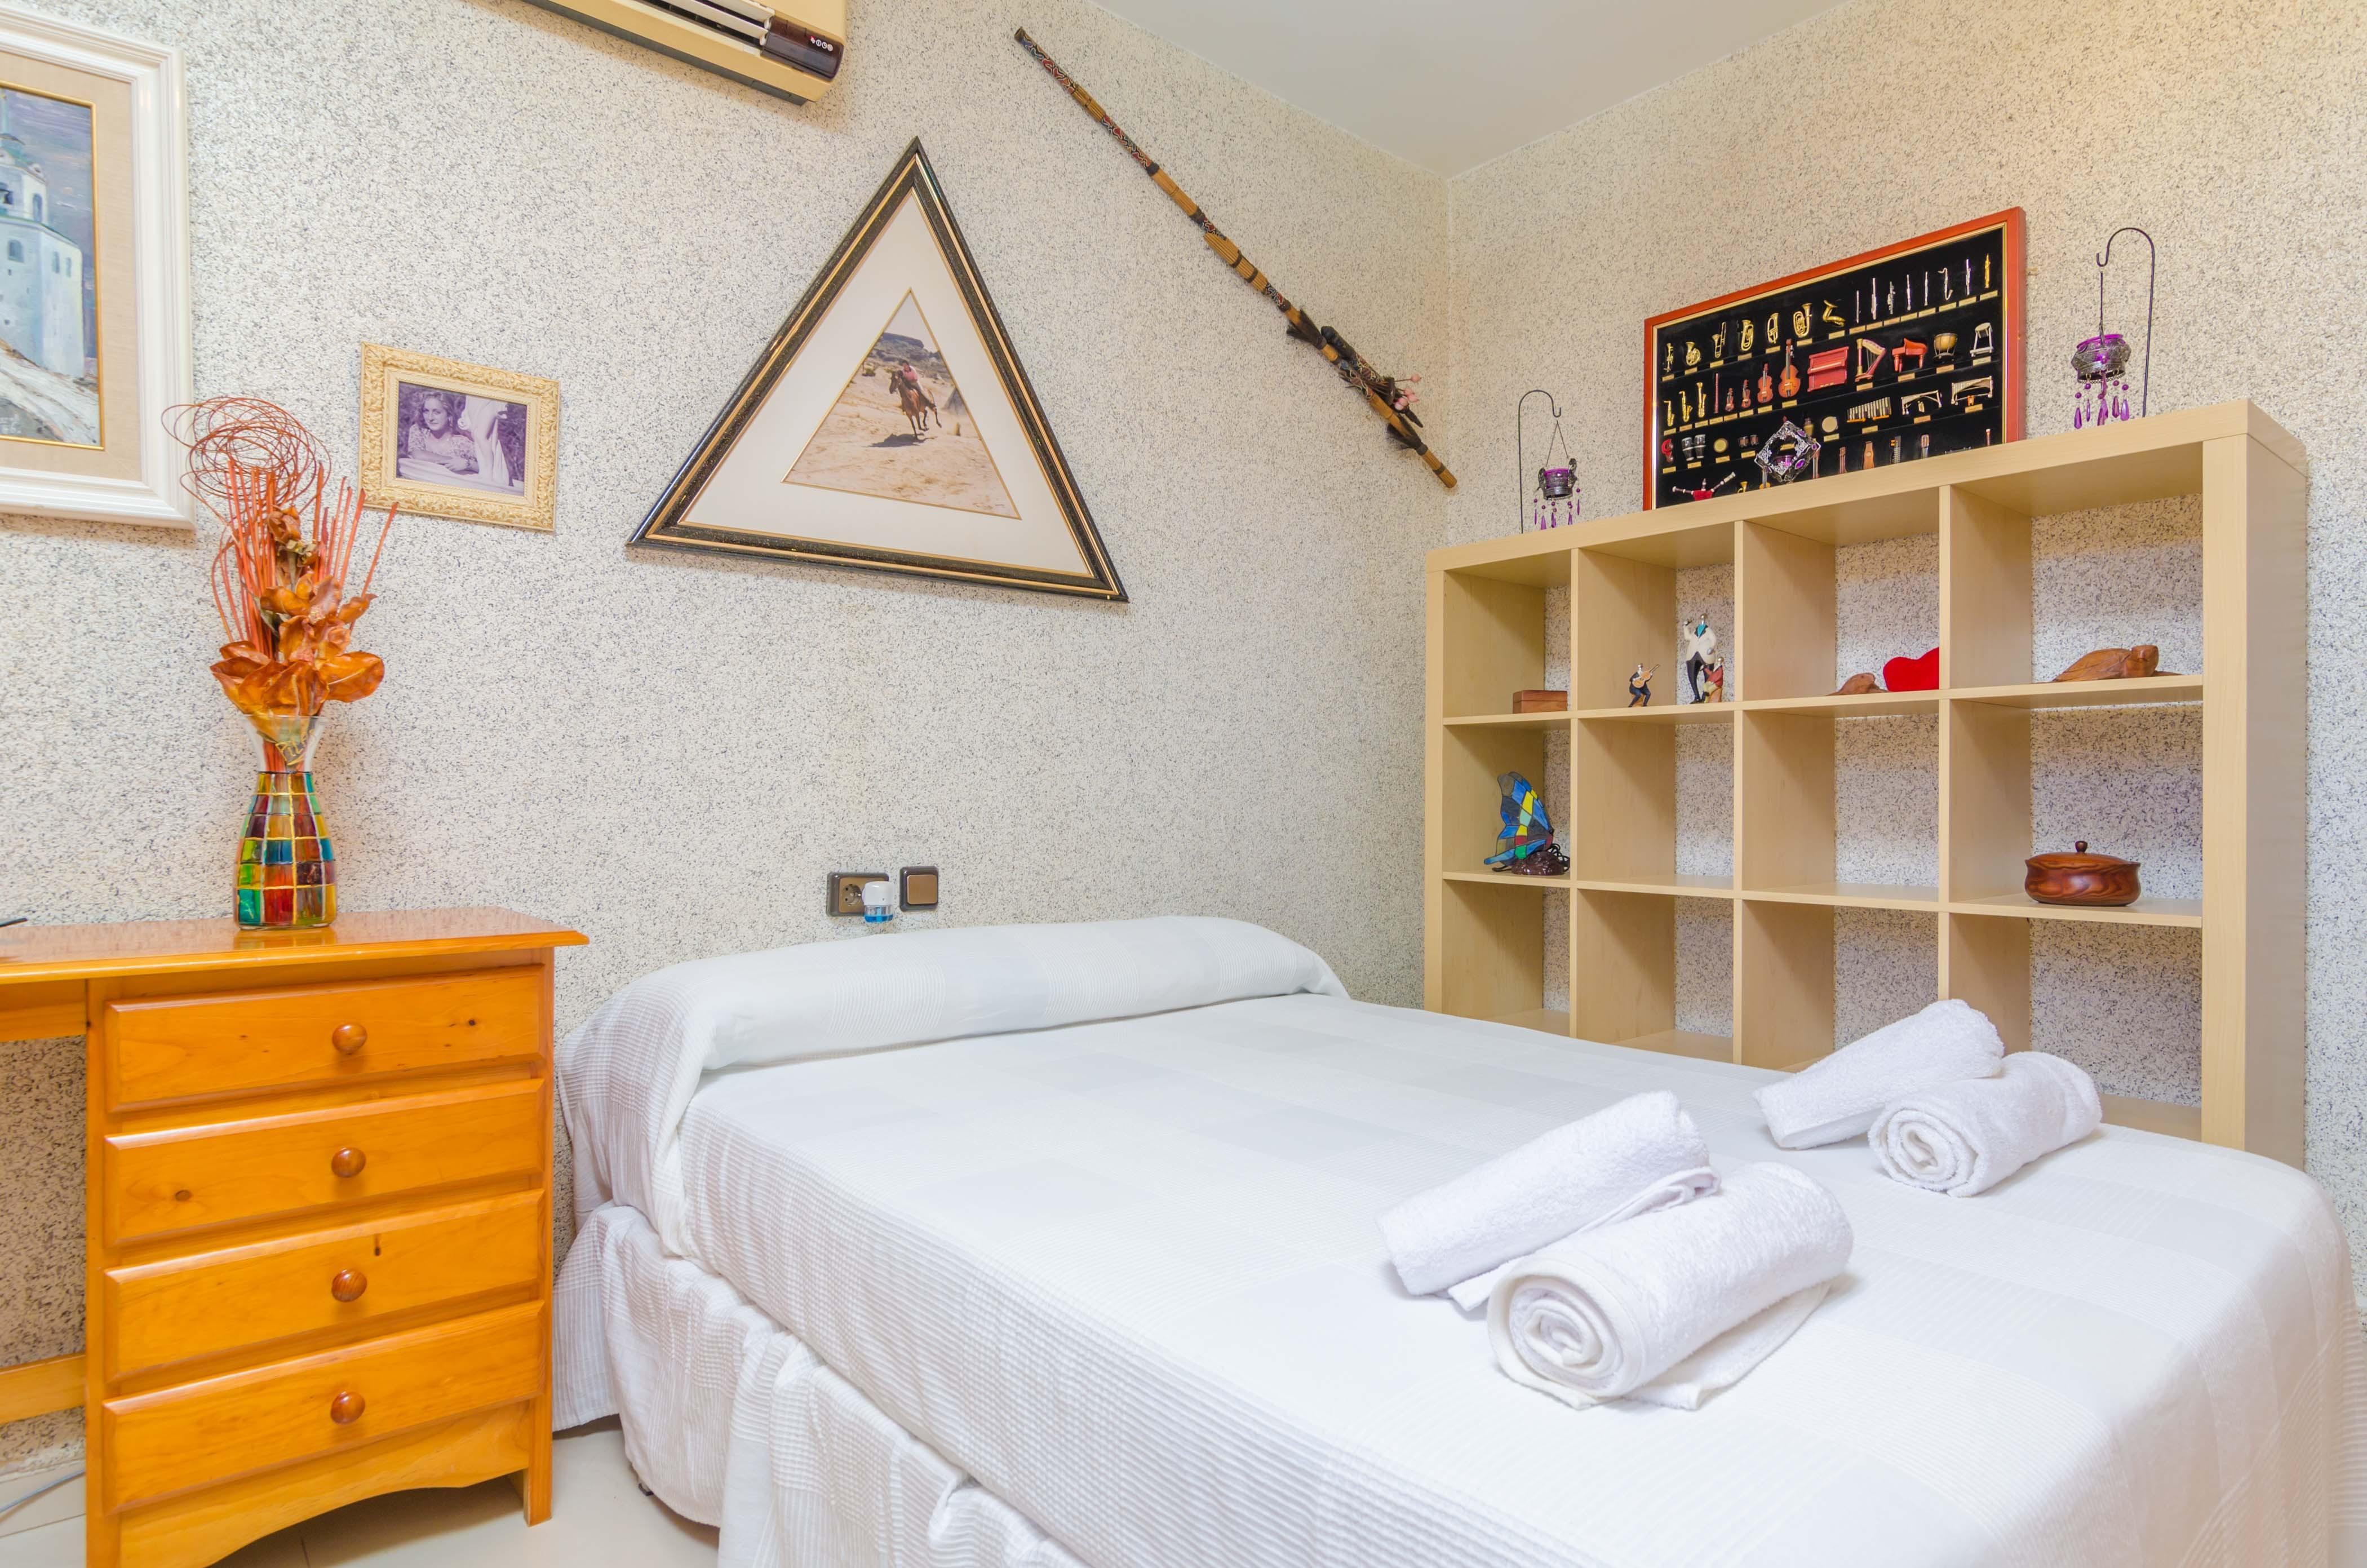 Ferienhaus CAN GORI (2296828), Badia Gran, Mallorca, Balearische Inseln, Spanien, Bild 21